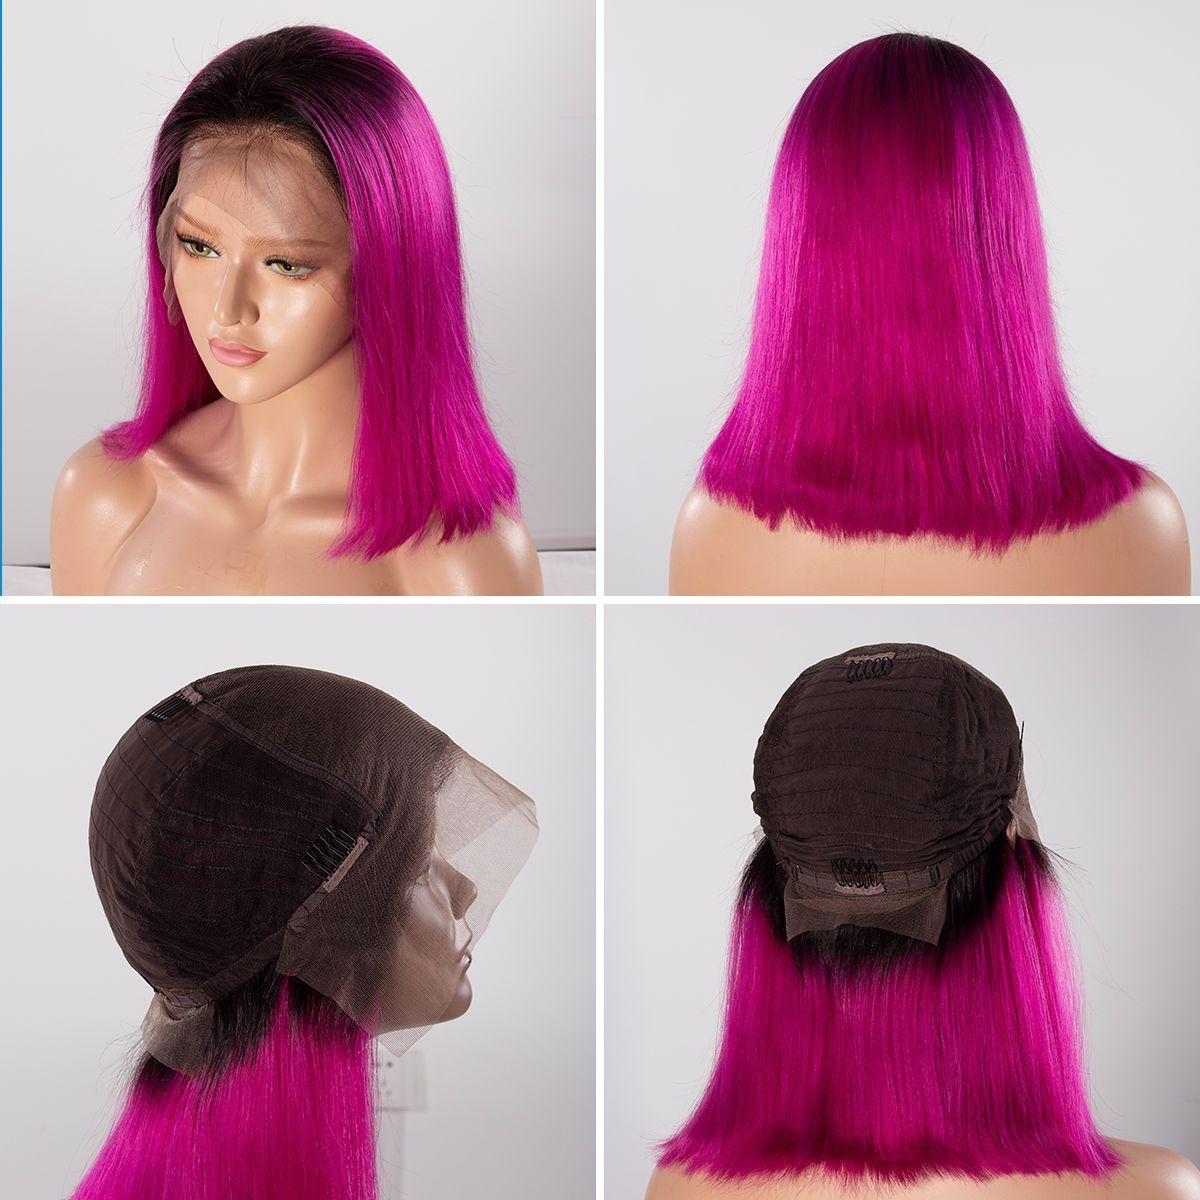 Colorful 13x6 Short Bob Straight Hair - 1B/Rose Red